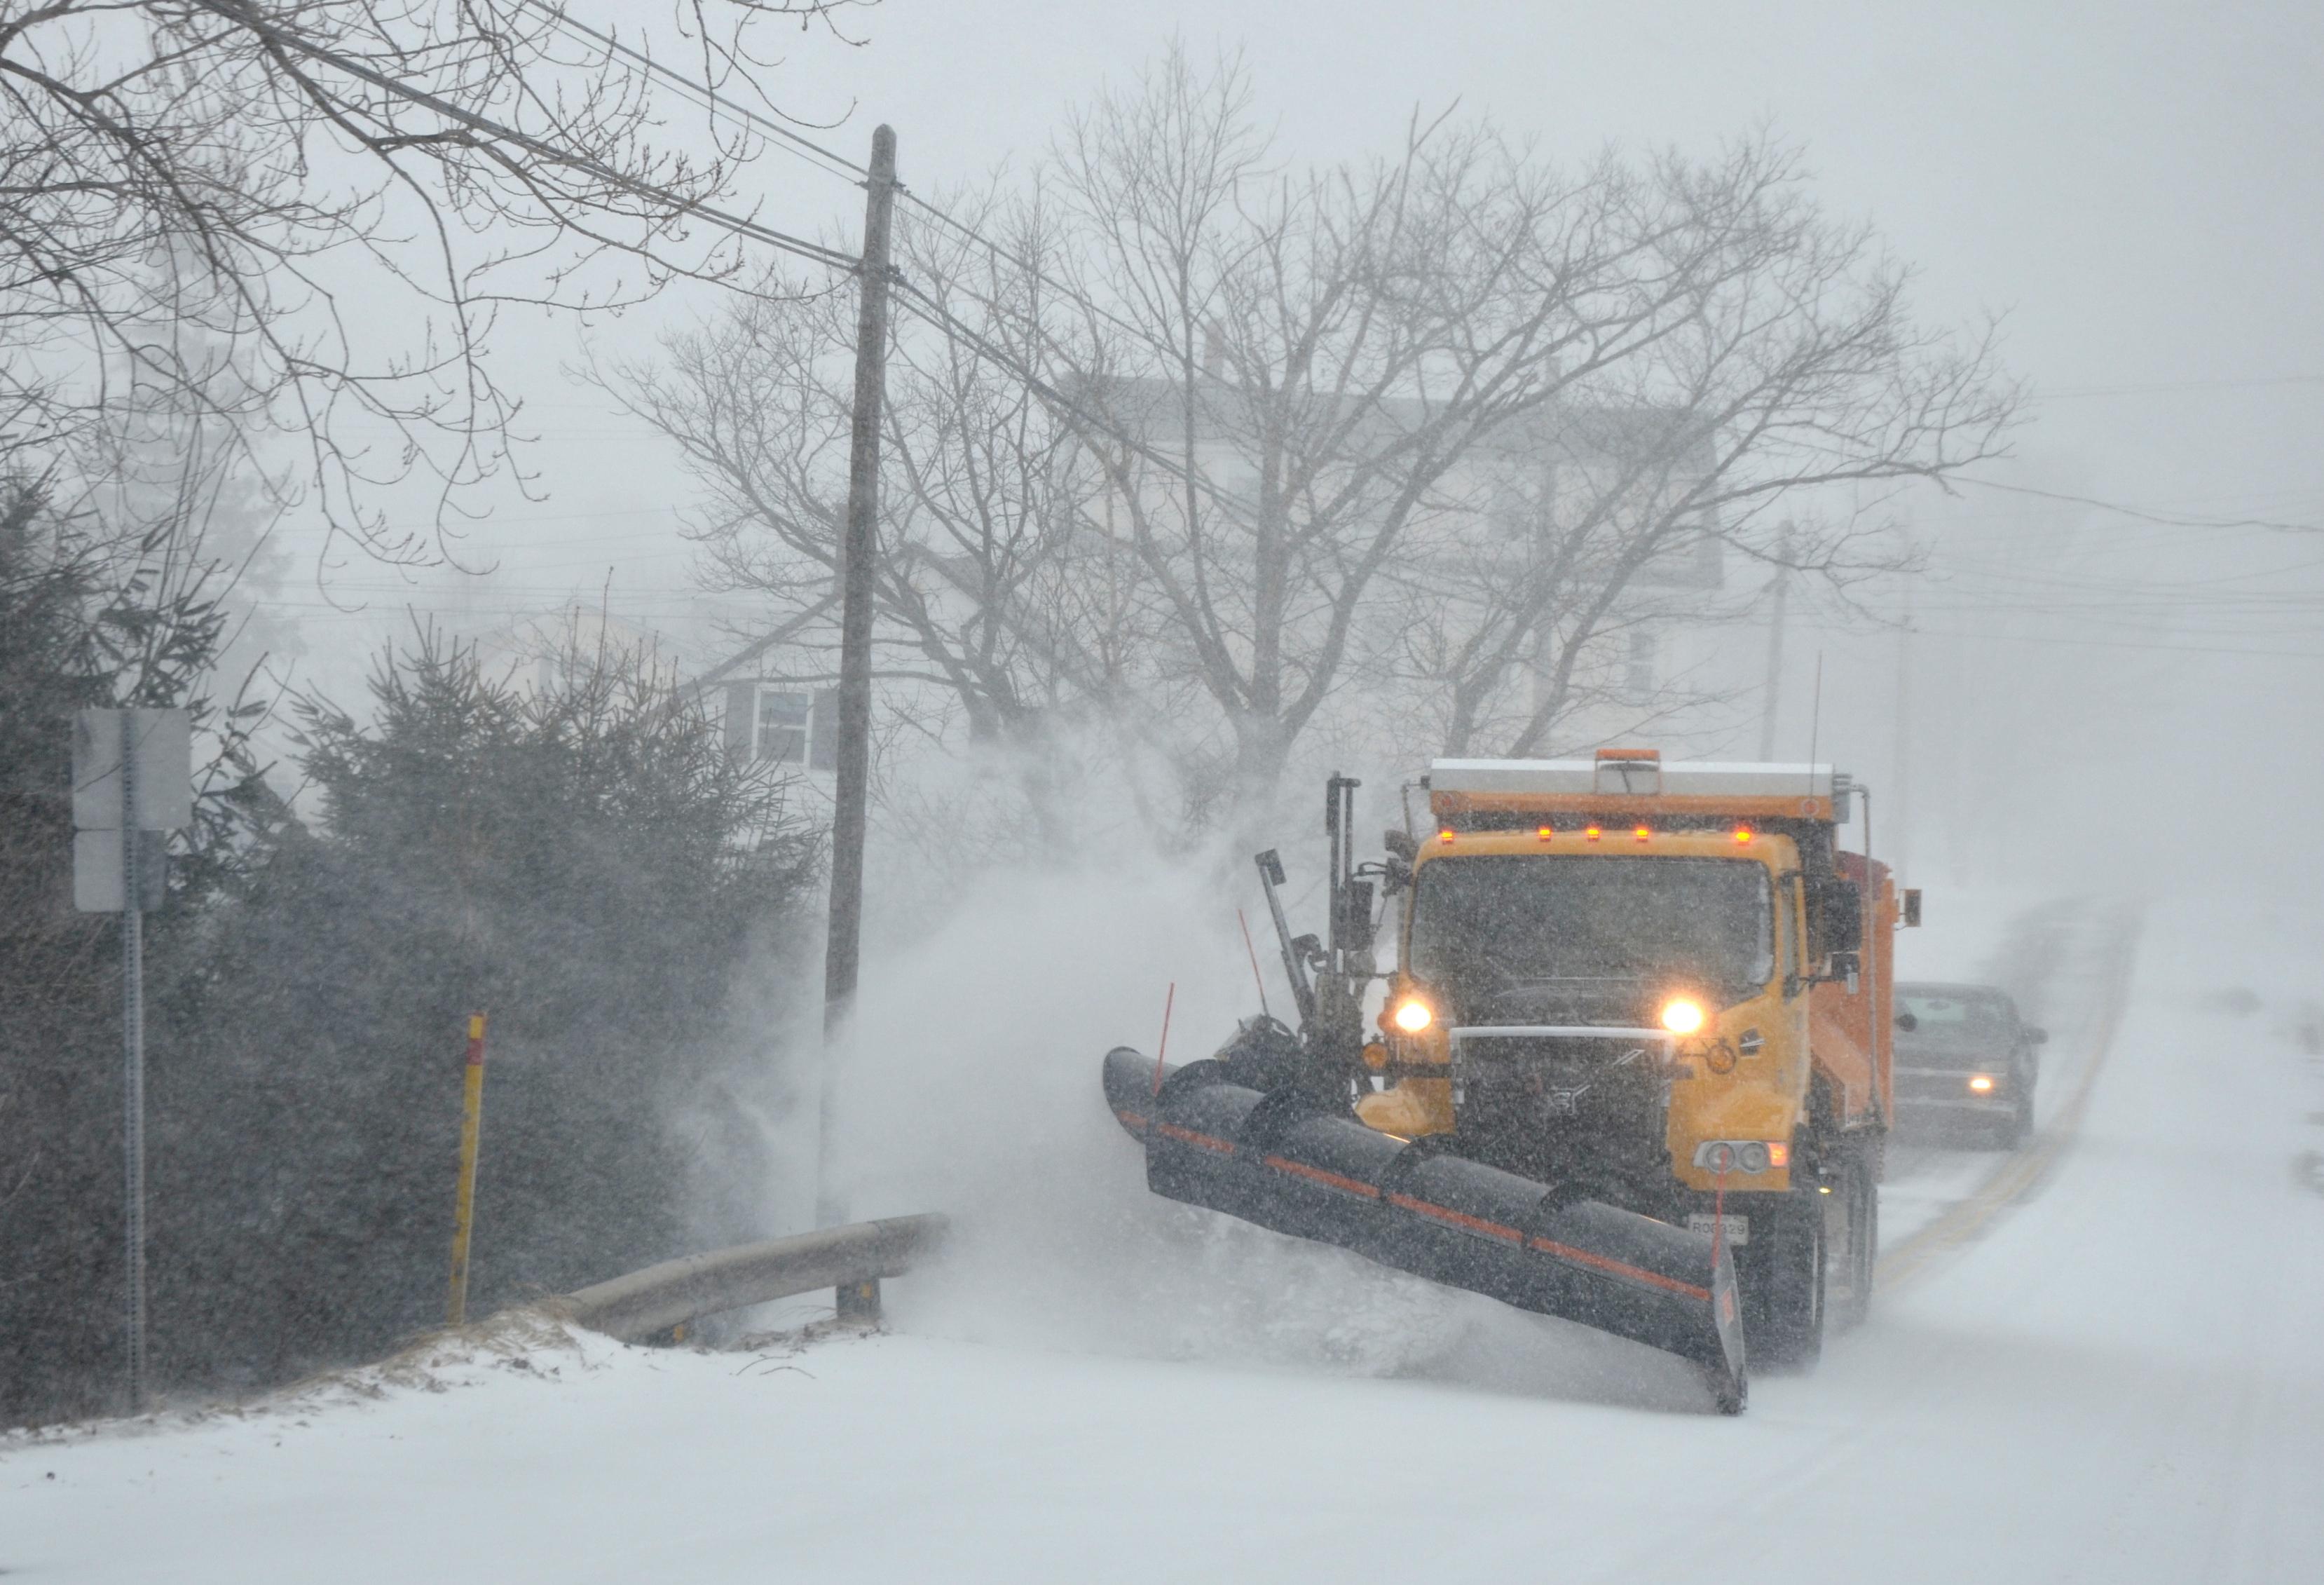 Heavy snowfall expected Tuesday